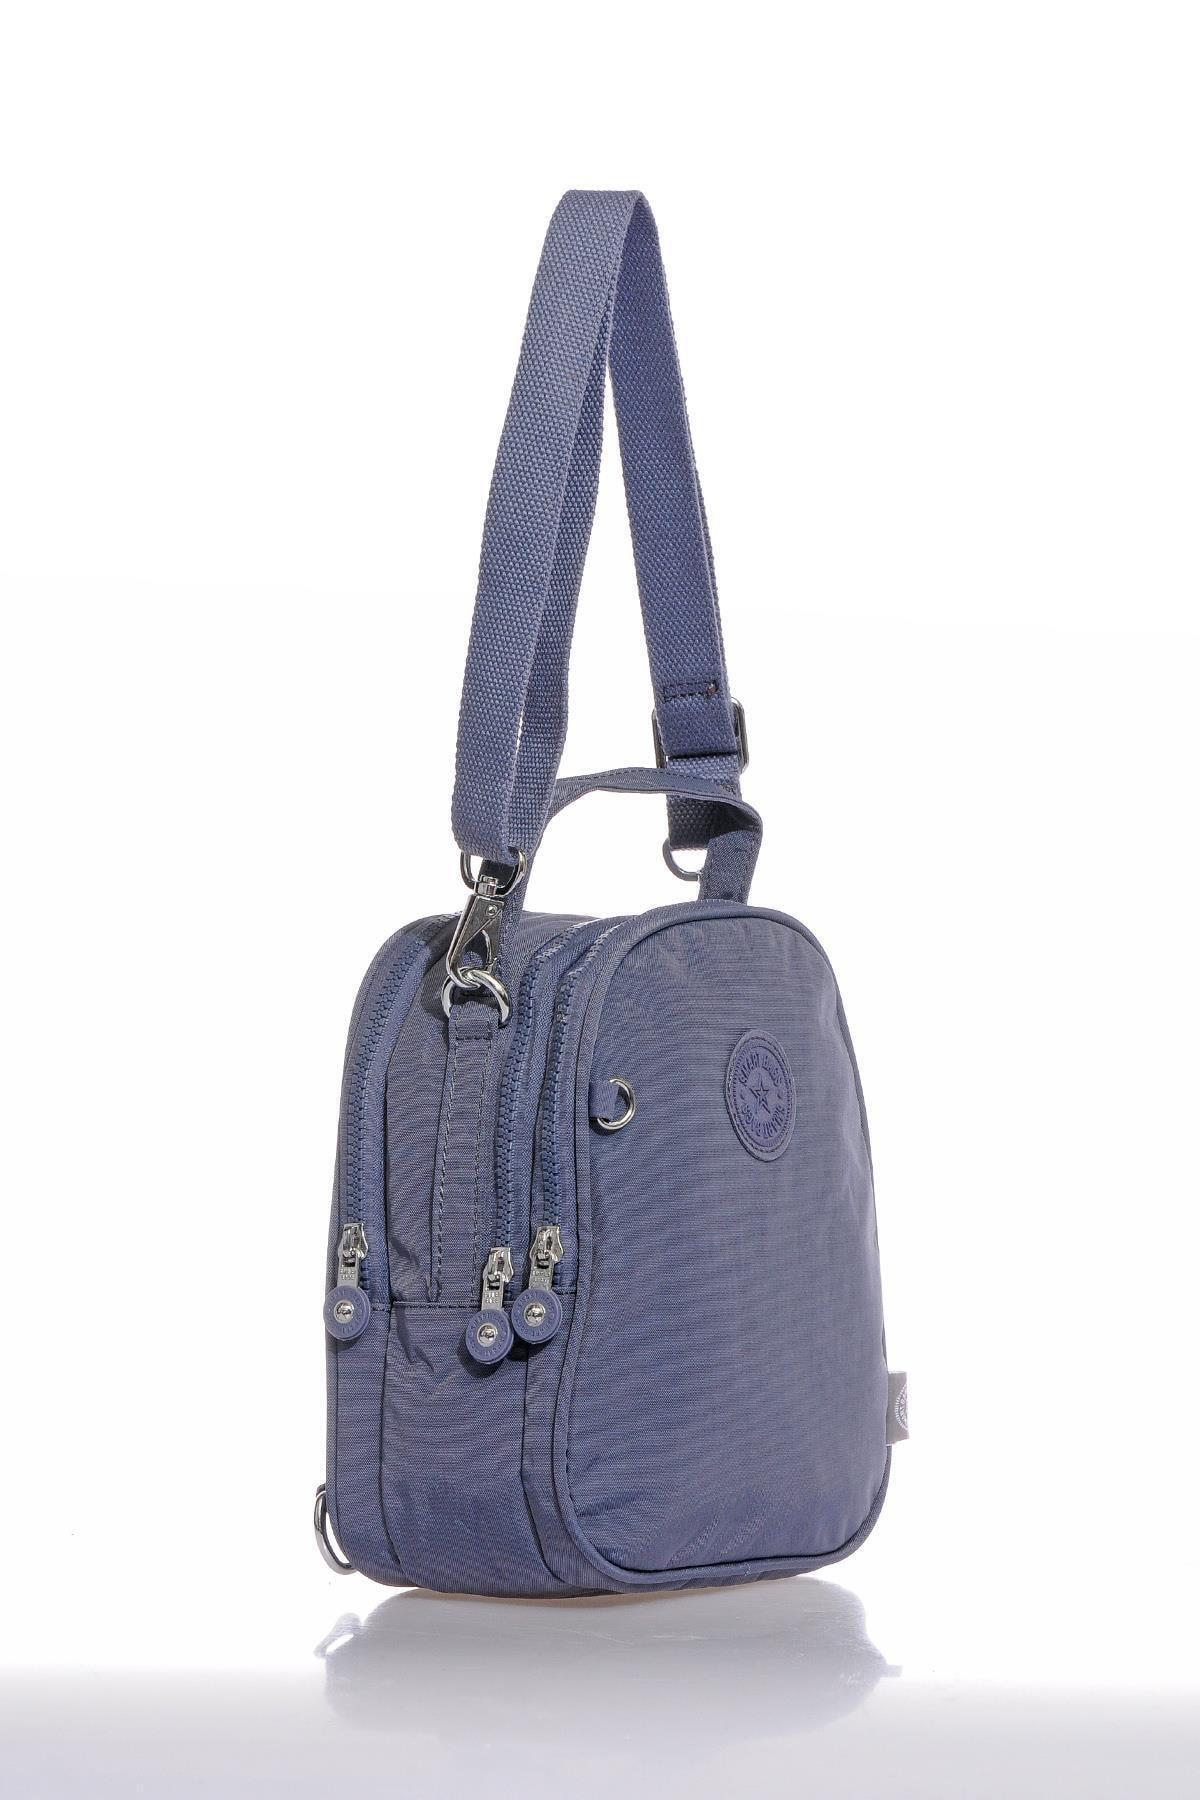 Smart Bags Smb3063-0089 Füme Kadın Sırt Çantası